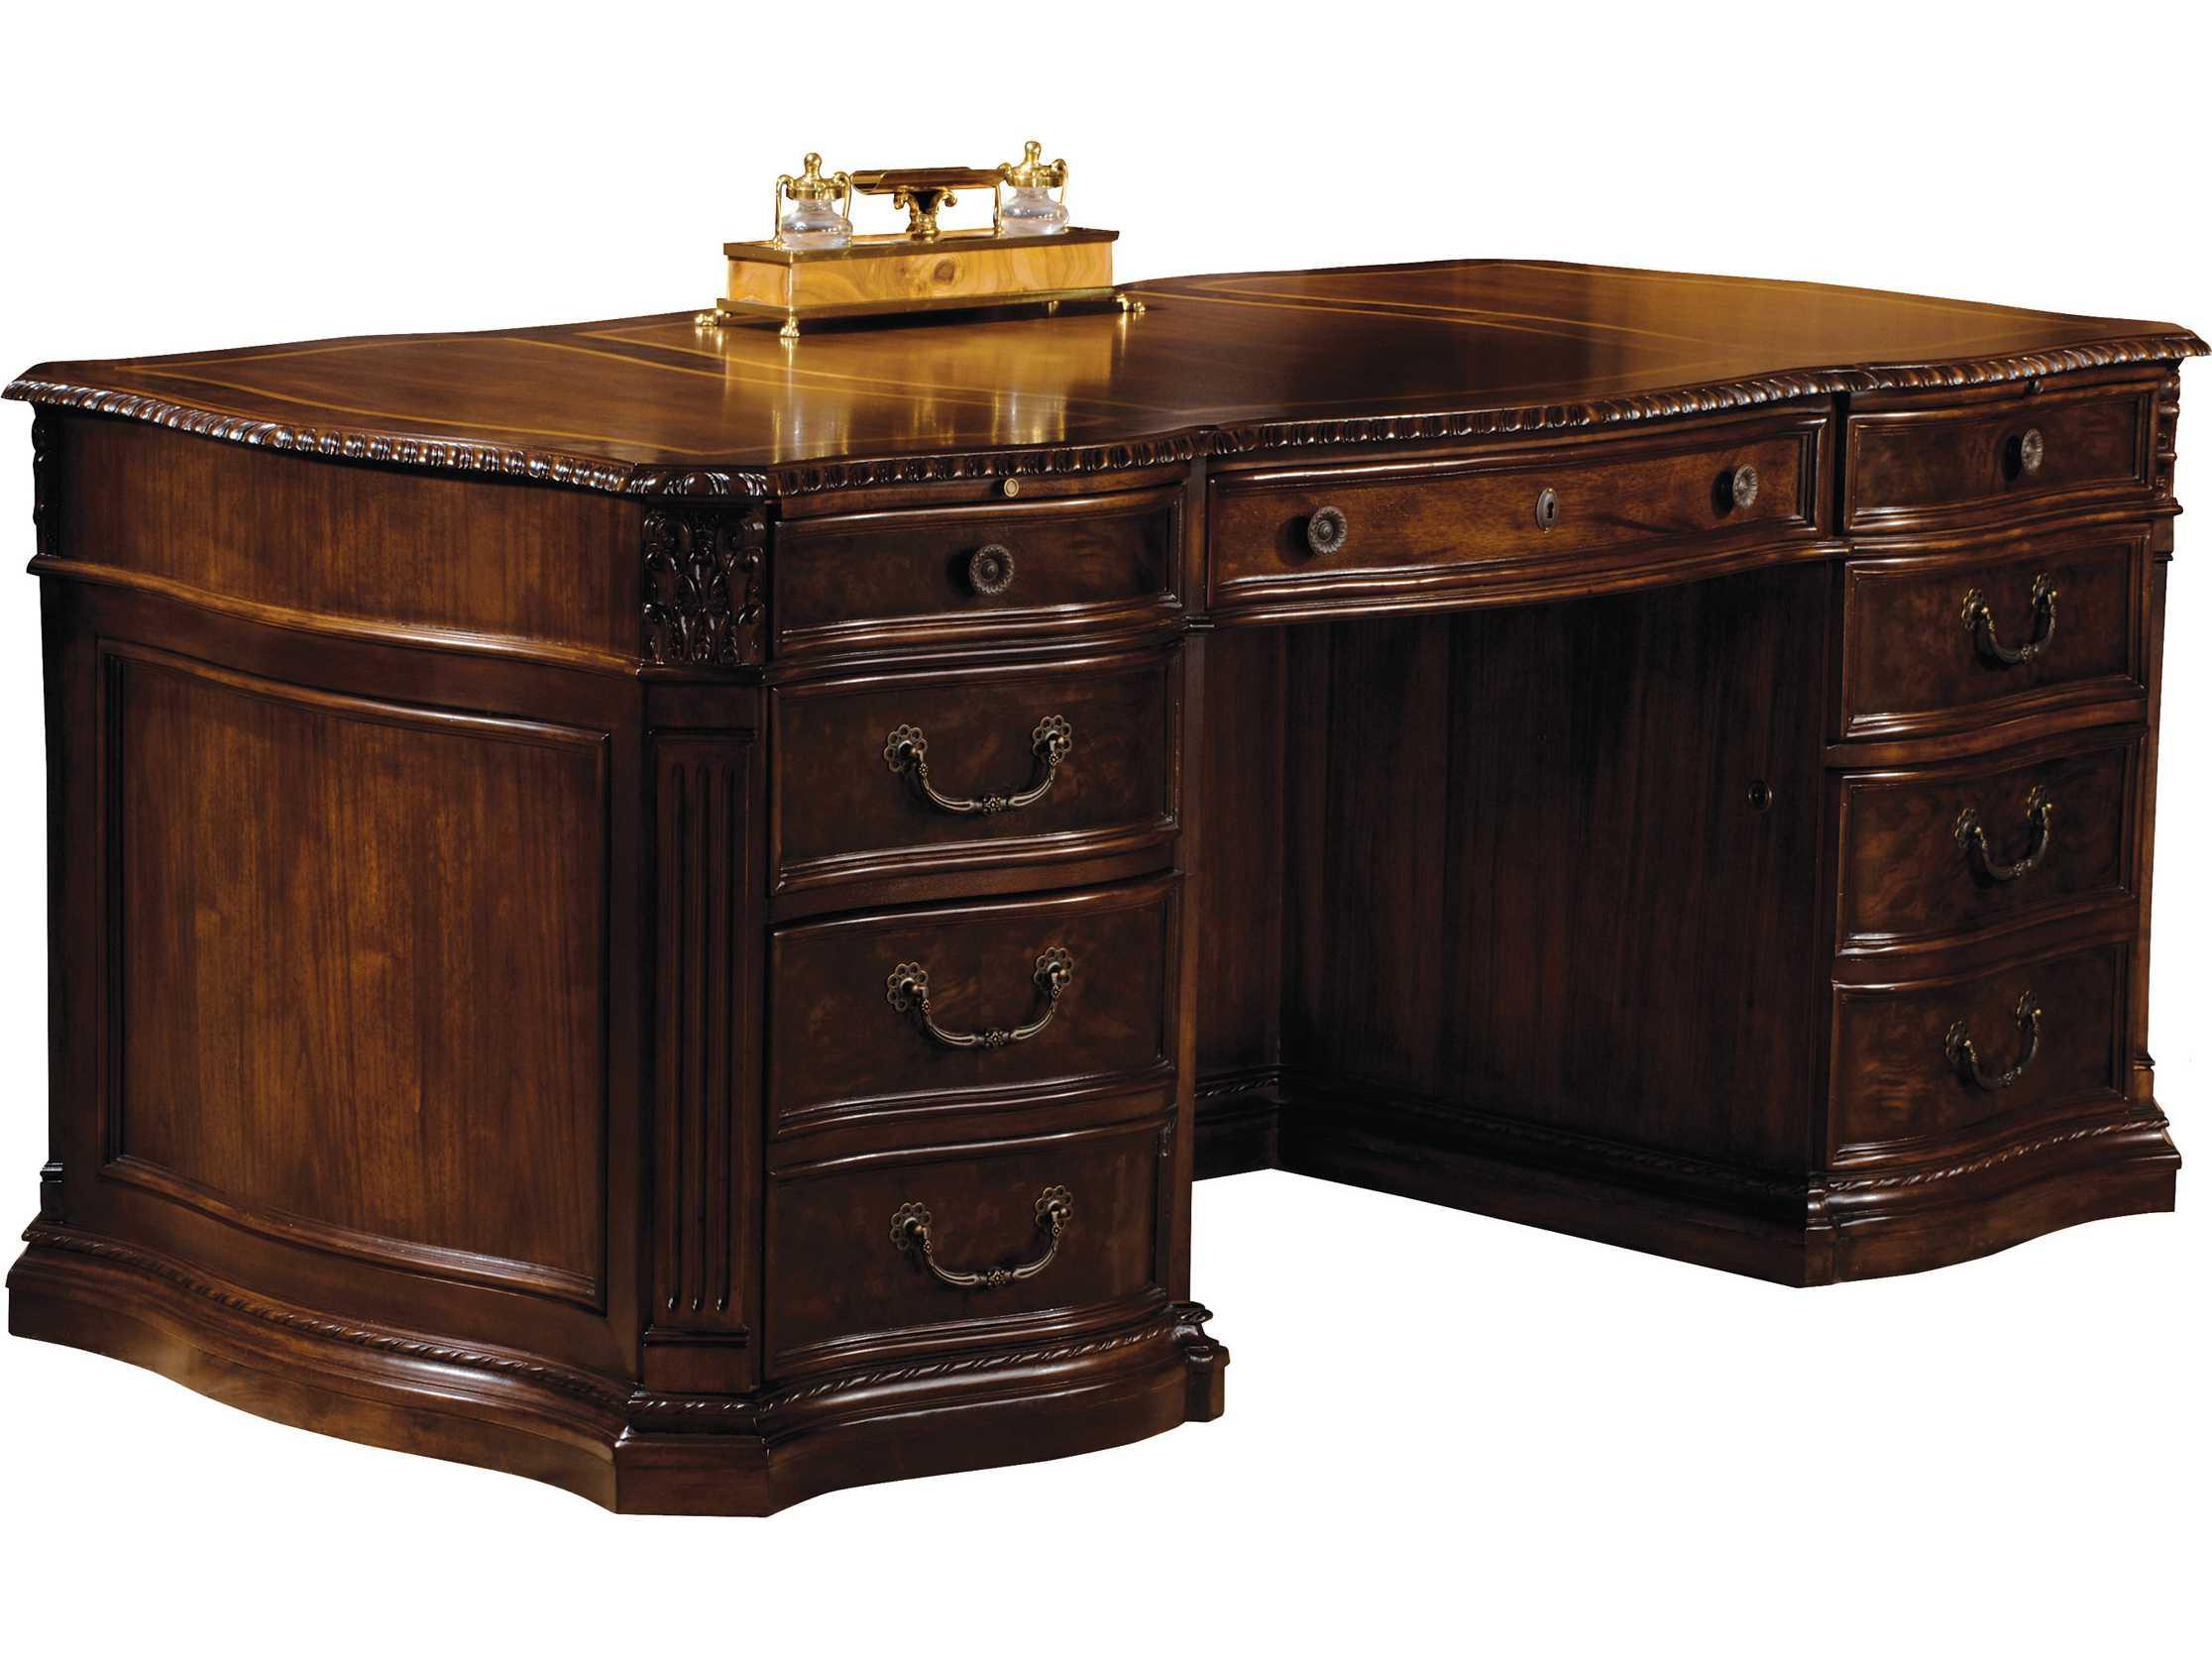 Hekman Office 72 x 36 Executive Desk in Old World Walnut